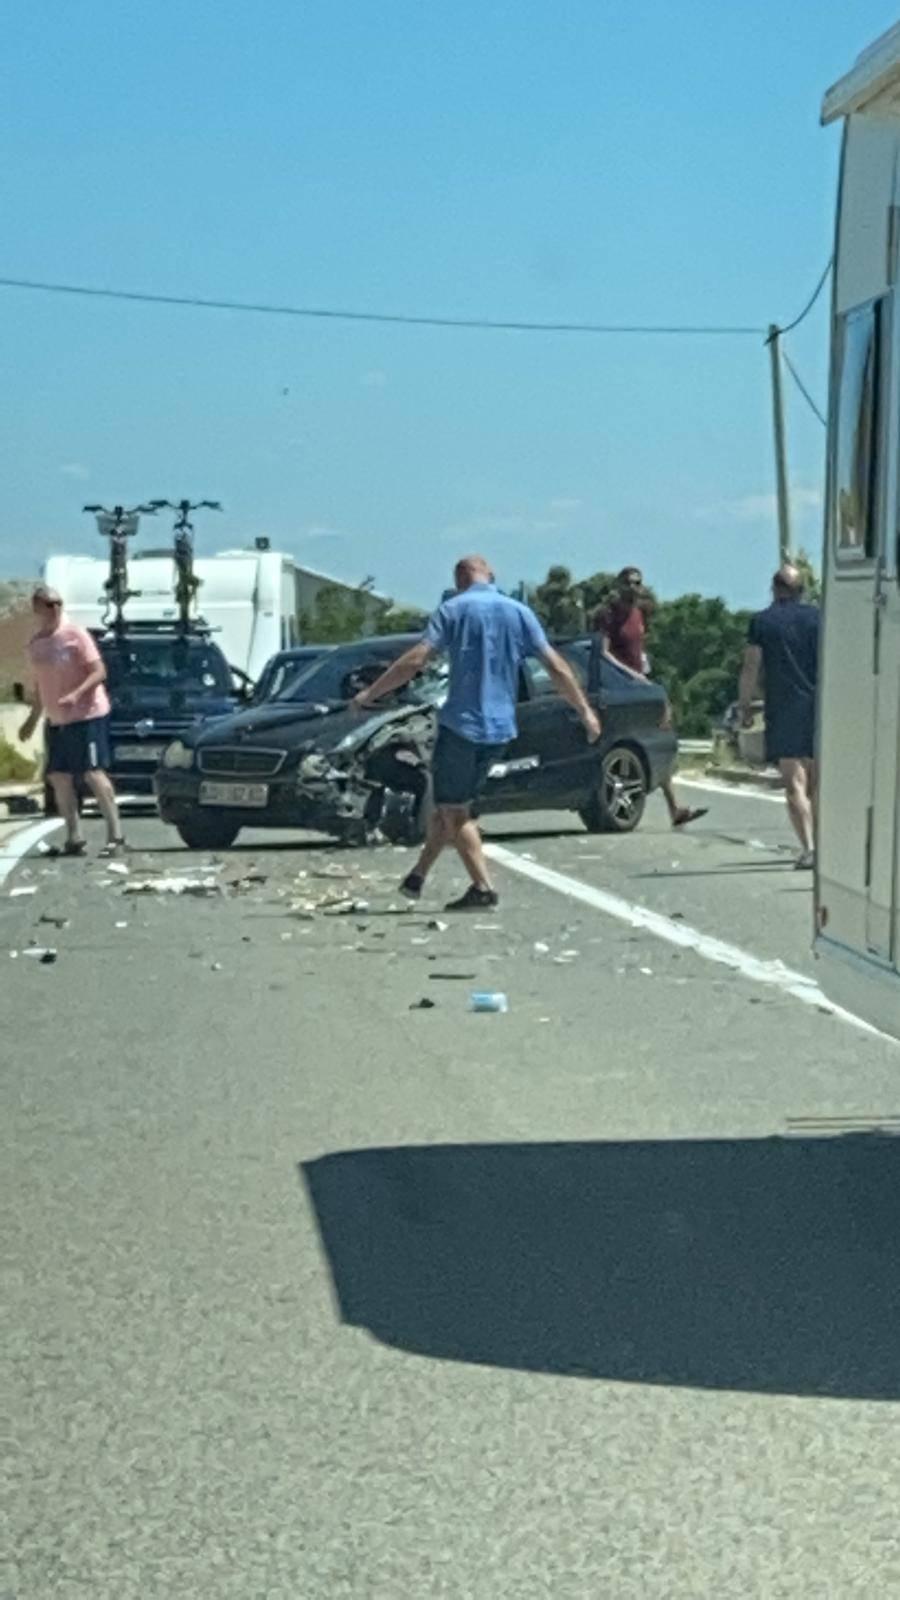 Sudarila se dva vozila nasred ceste na Pagu: 'Bilo je strašno, dijelovi auta su letjeli posvuda'